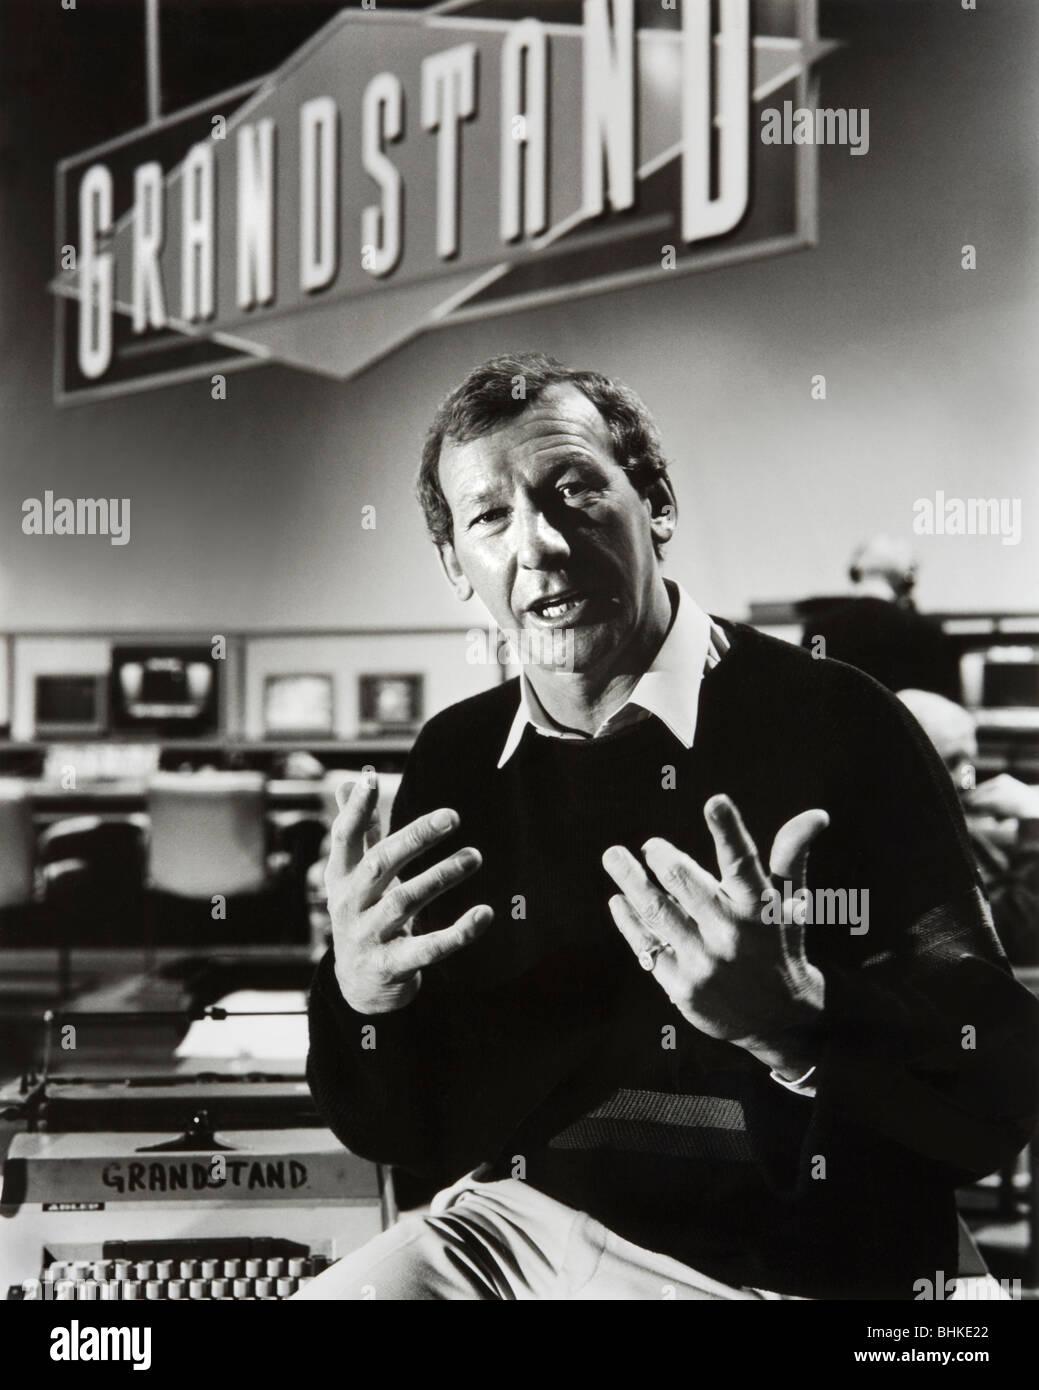 Mr Bob Wilson OBE, on the BBC Grandstand set in 1987. - Stock Image